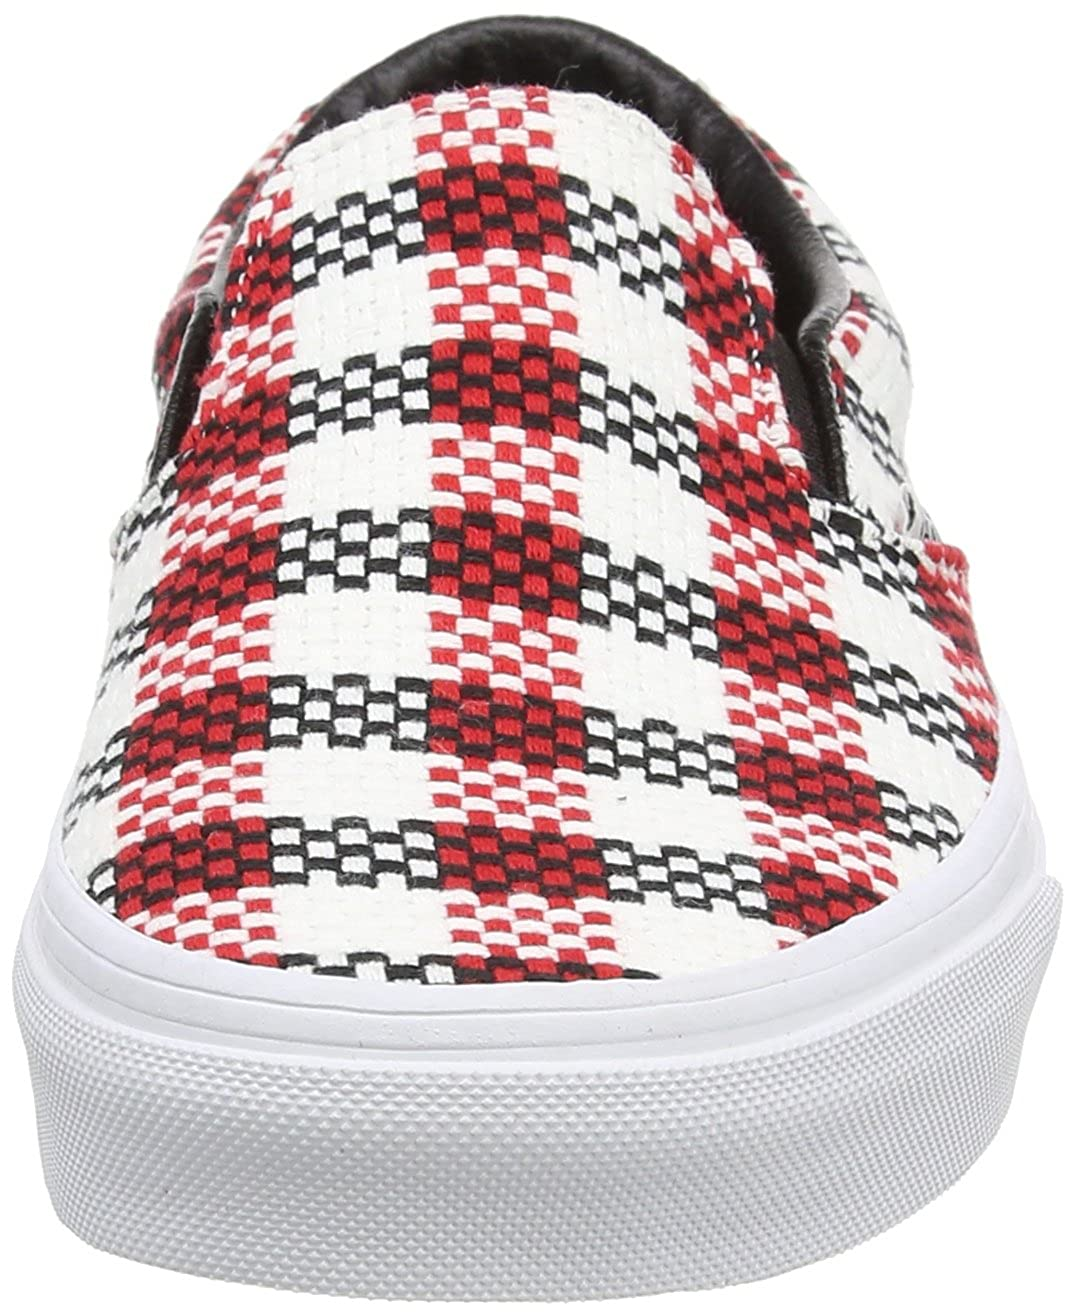 Vans Vans Vans Unisex-Erwachsene Classic Slip-On, Mehrfarbig Multicolour(schwarz/Weiß/ROT) 1d1d20